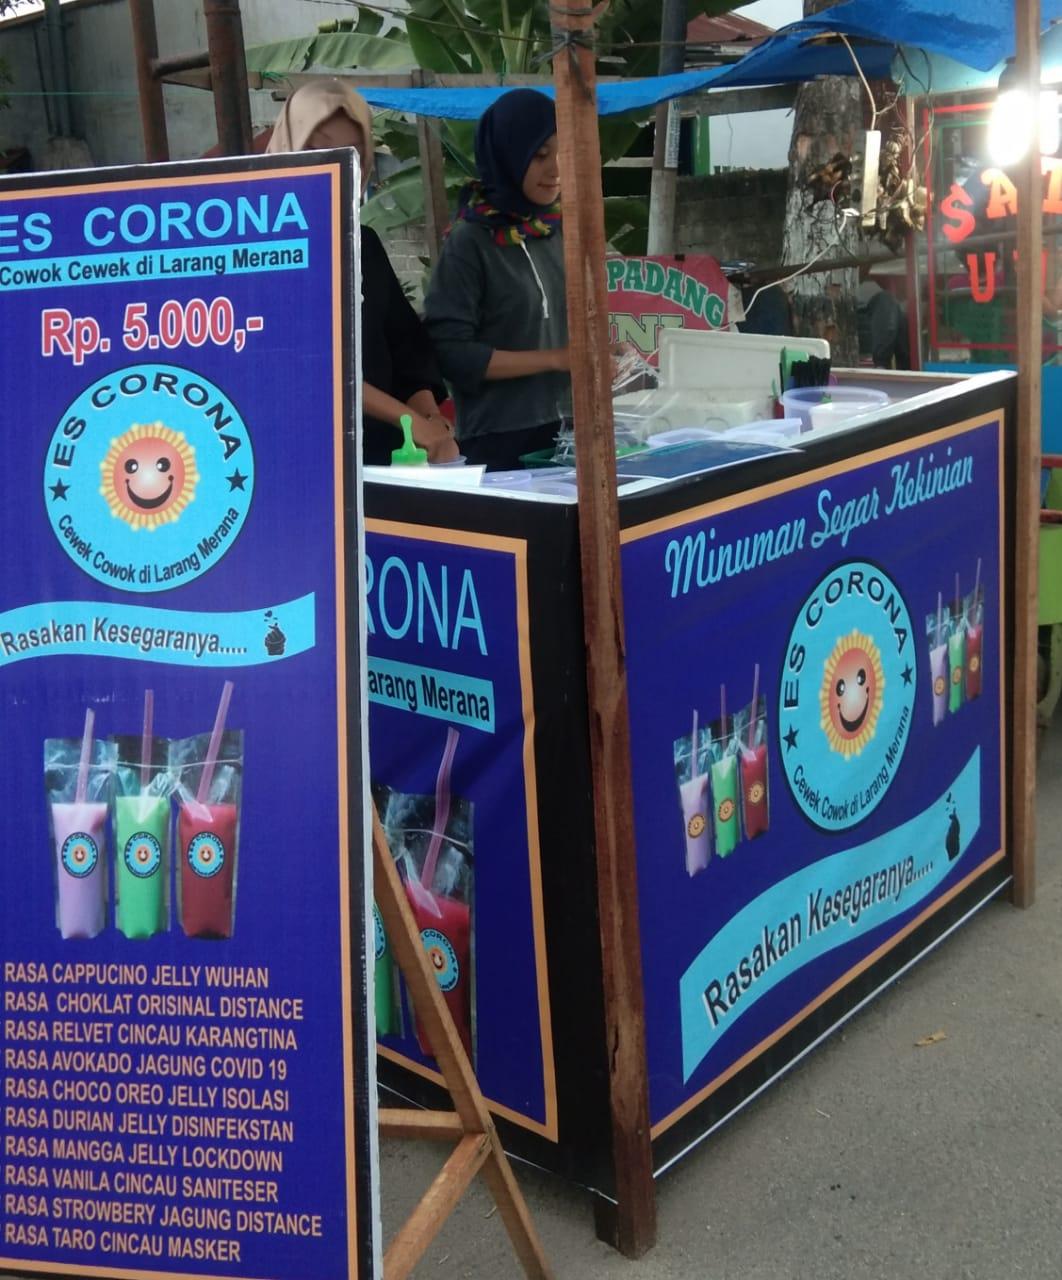 Cewek Cantik, Penjual Es Corona